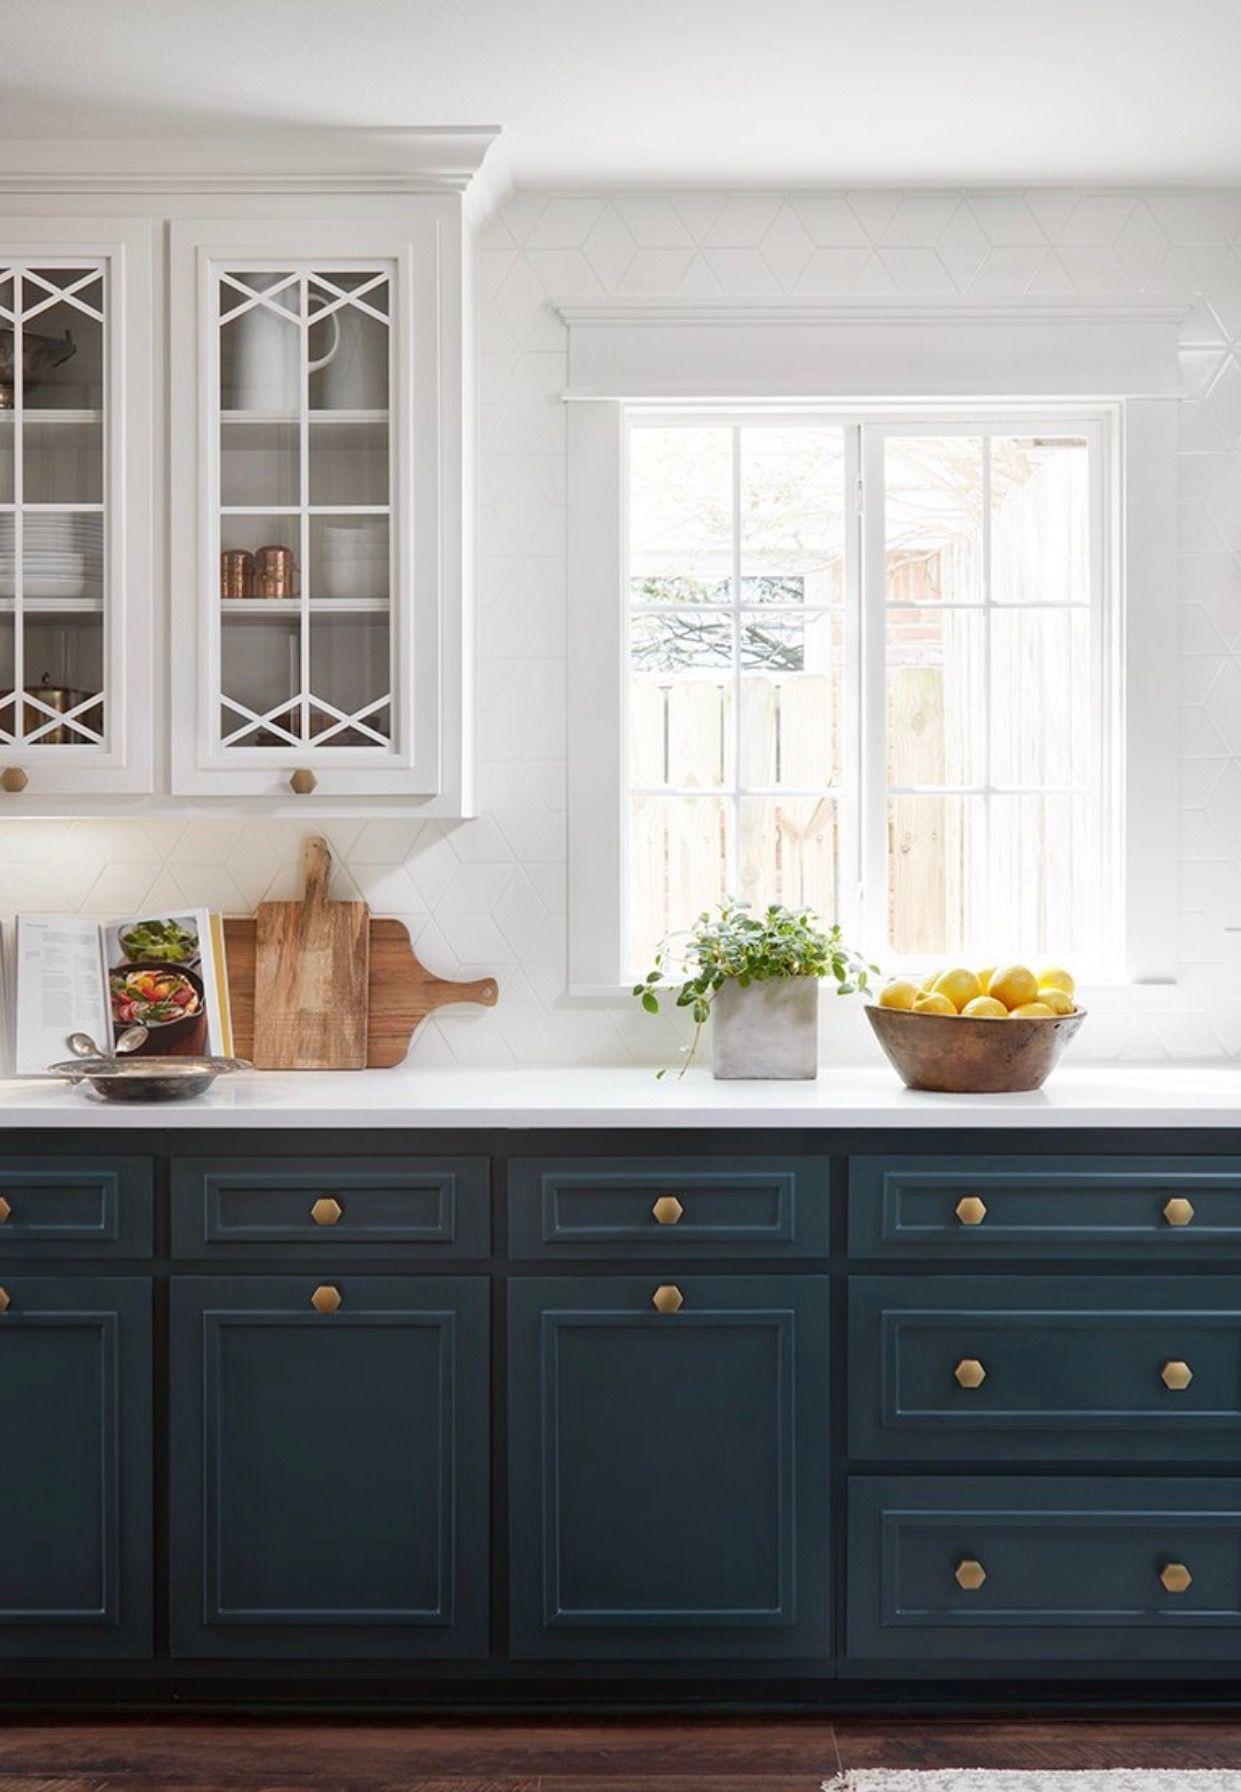 Kmart Room Decor in 2020 | Kitchen renovation, Blue ...